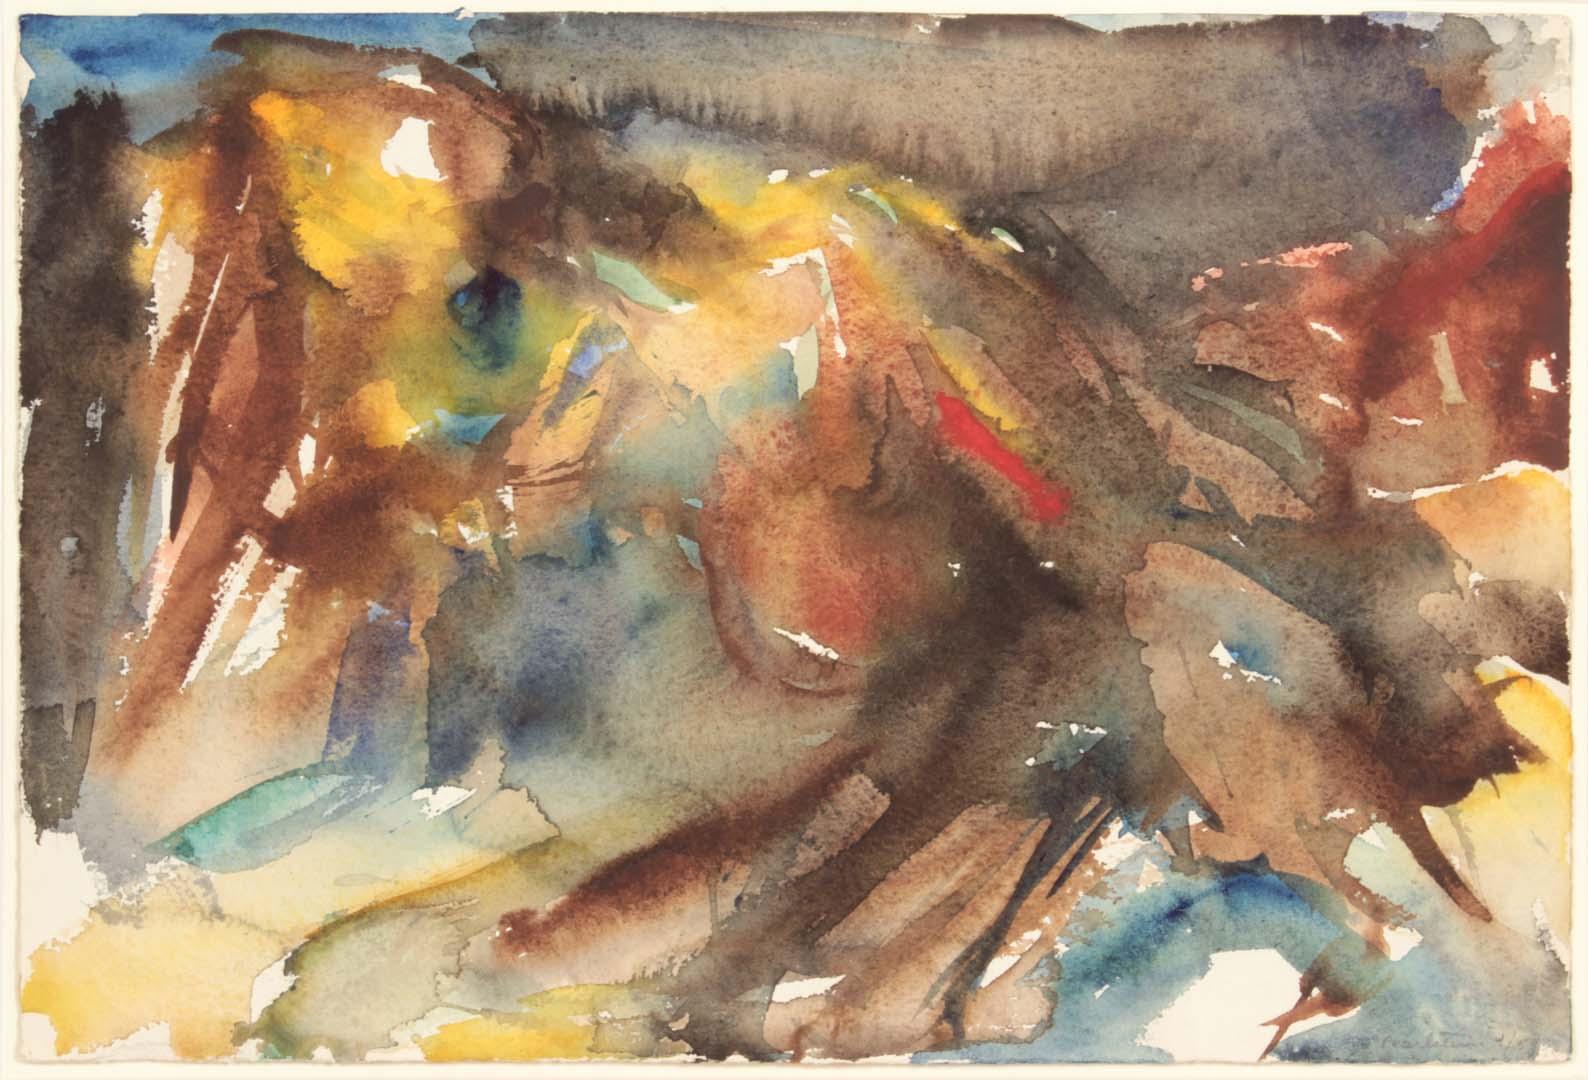 1954 Montauk Rocks #6 Watercolor on Paper 9.875 x 14.875